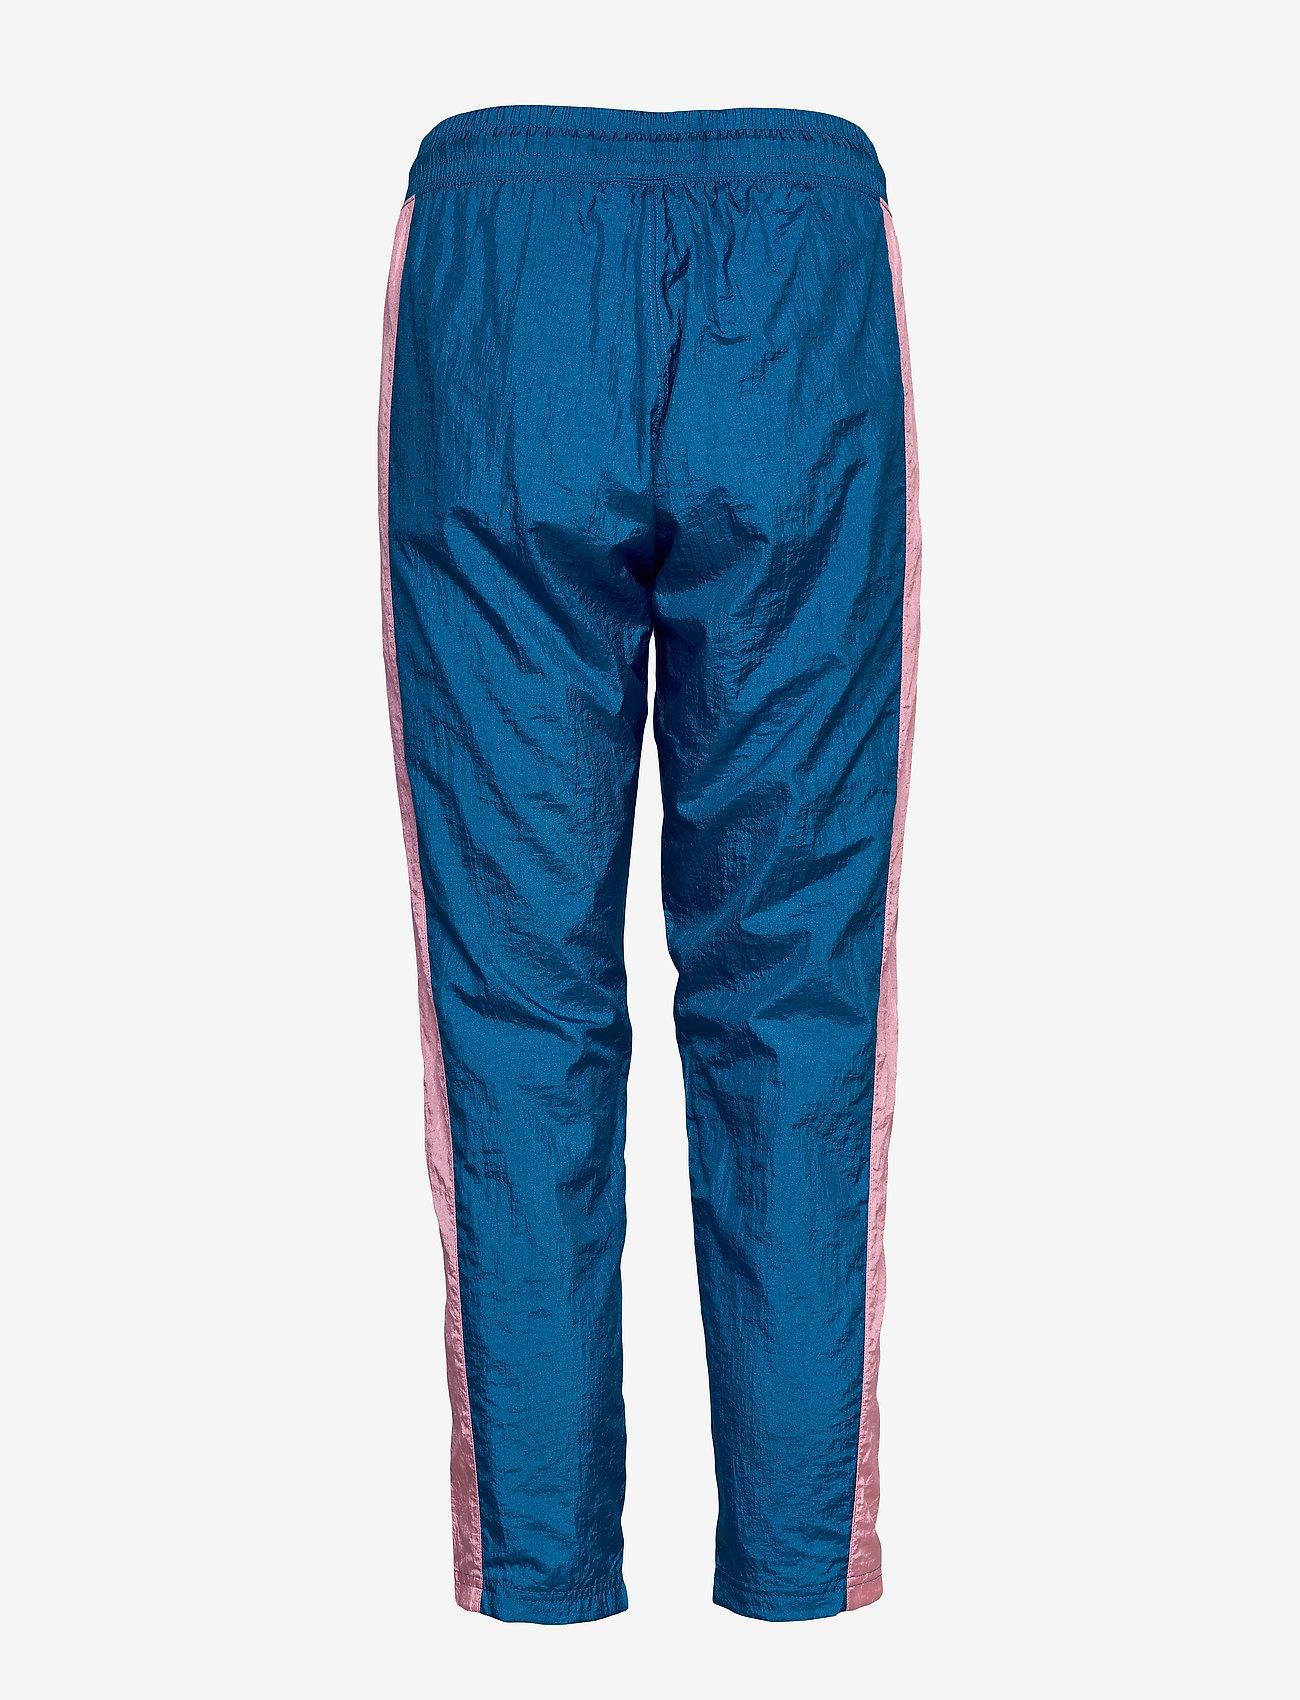 Straight Hem Pants (Imperial Blue) - Champion 3pB1Dv